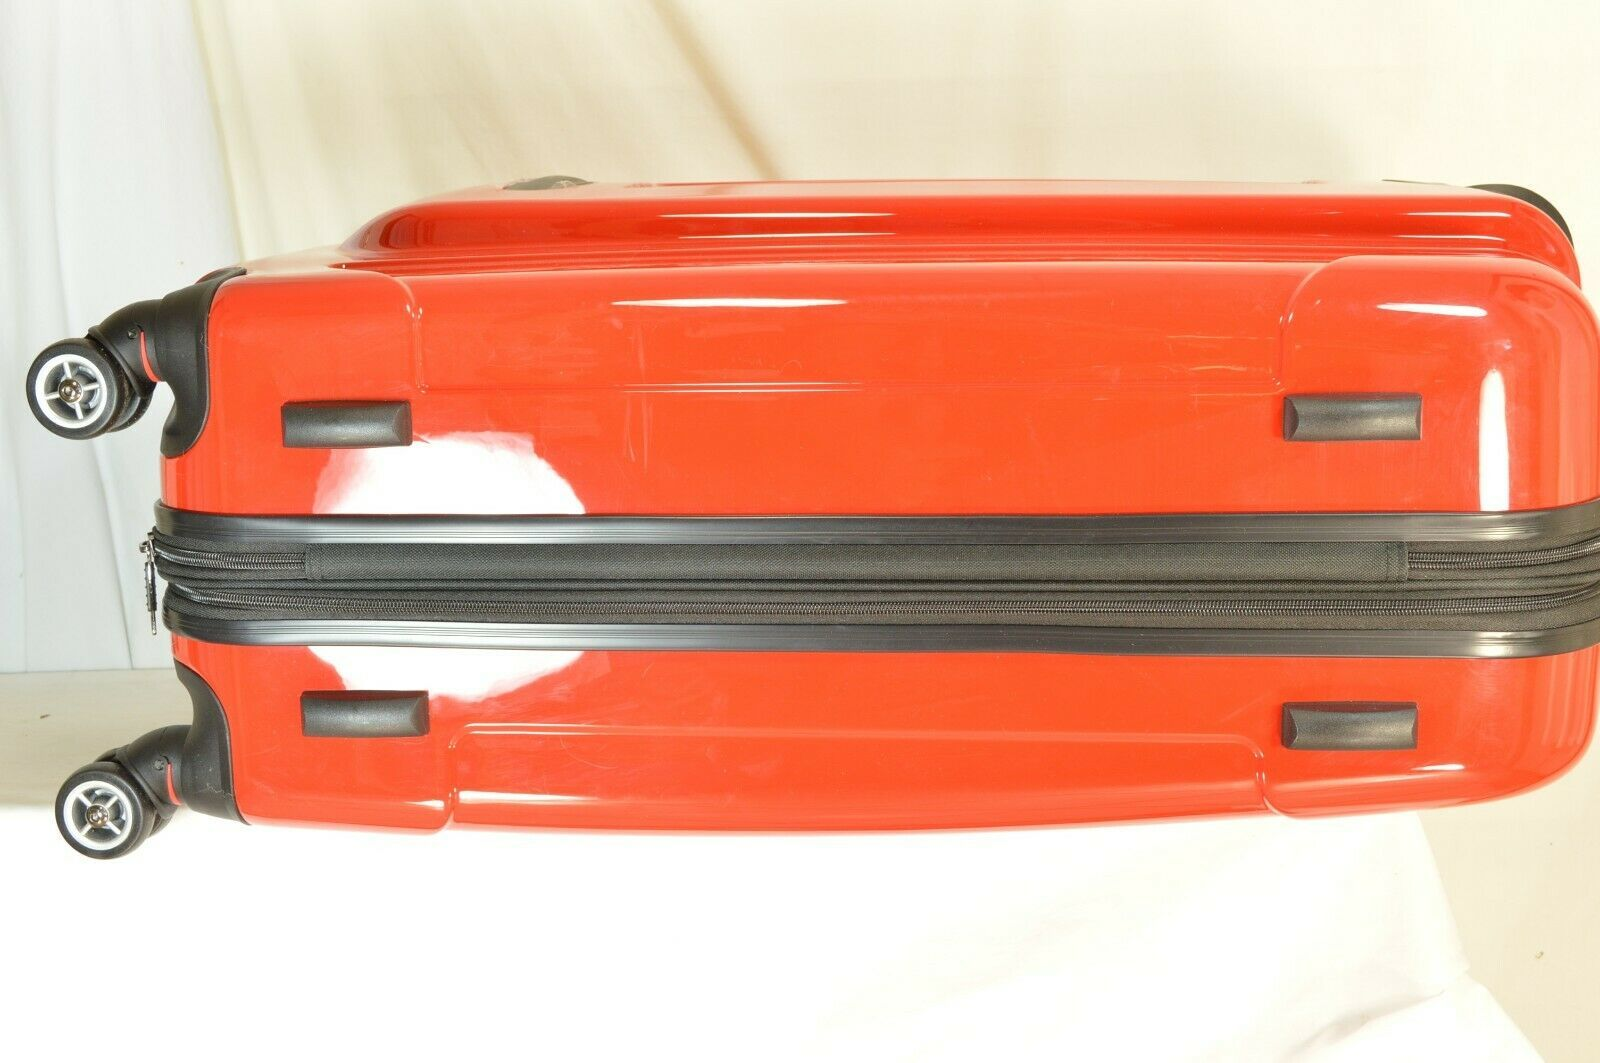 "Traveler's Choice 29"" Sedona new spinner red polycarbonate shell combo lock image 3"